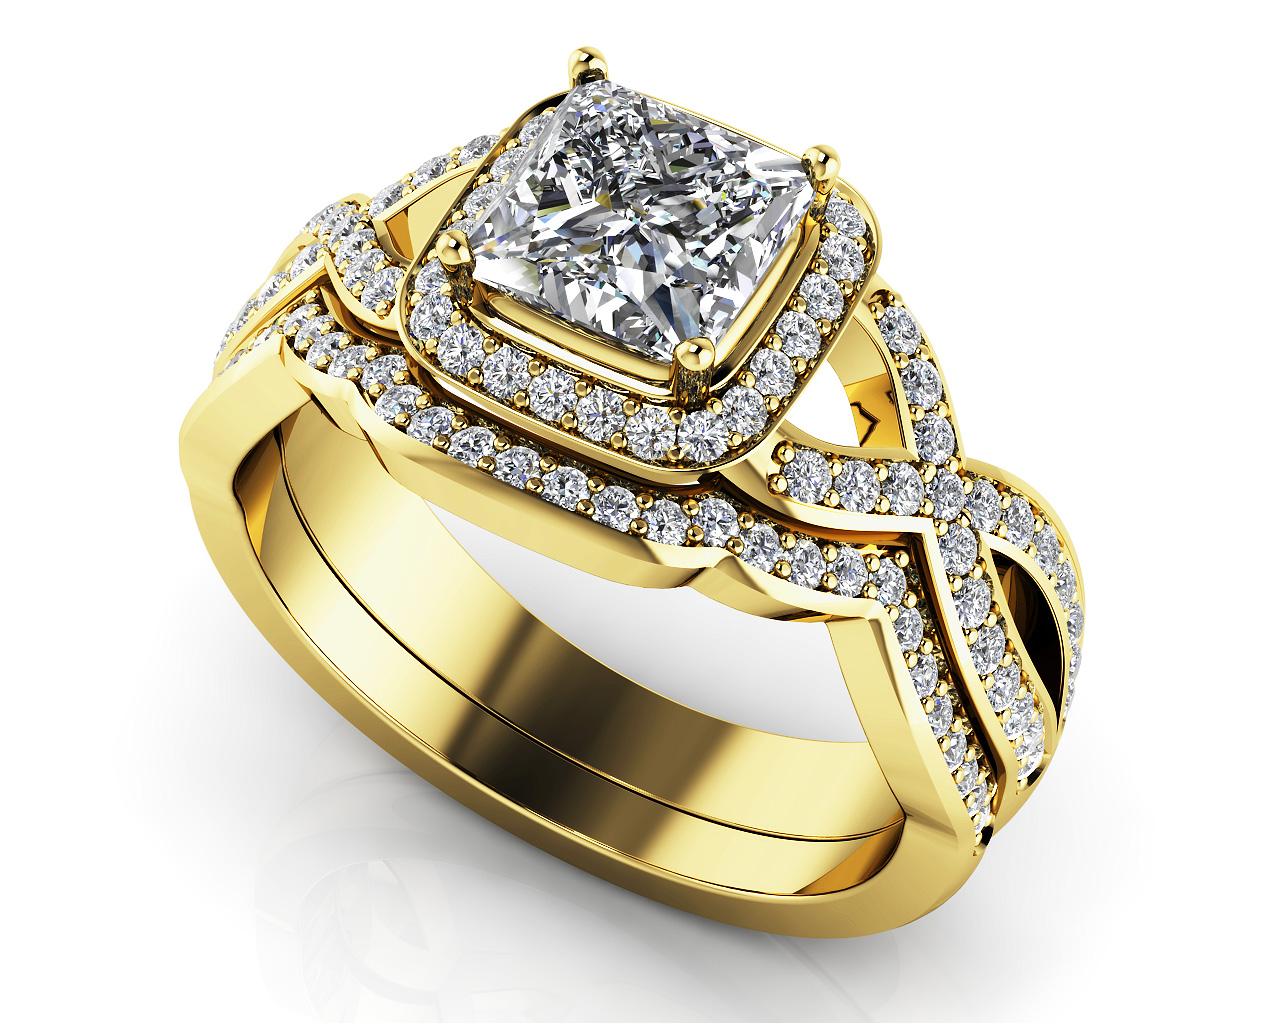 Woven Band Princess Diamond Bridal Set from Anjolee Jewelry